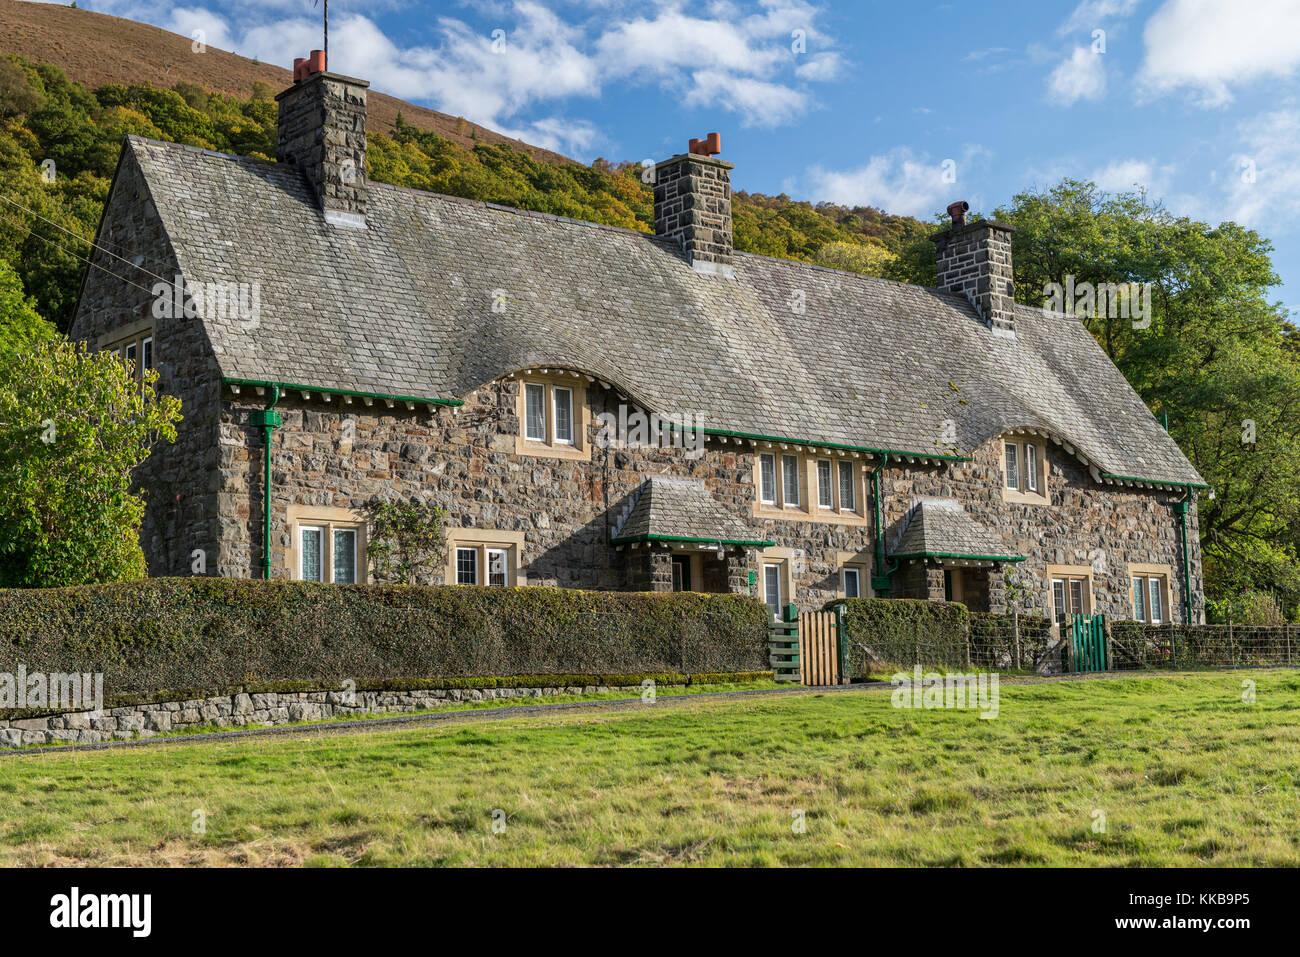 Stone Cottage Welsh Slate Roof Stock Photos Amp Stone